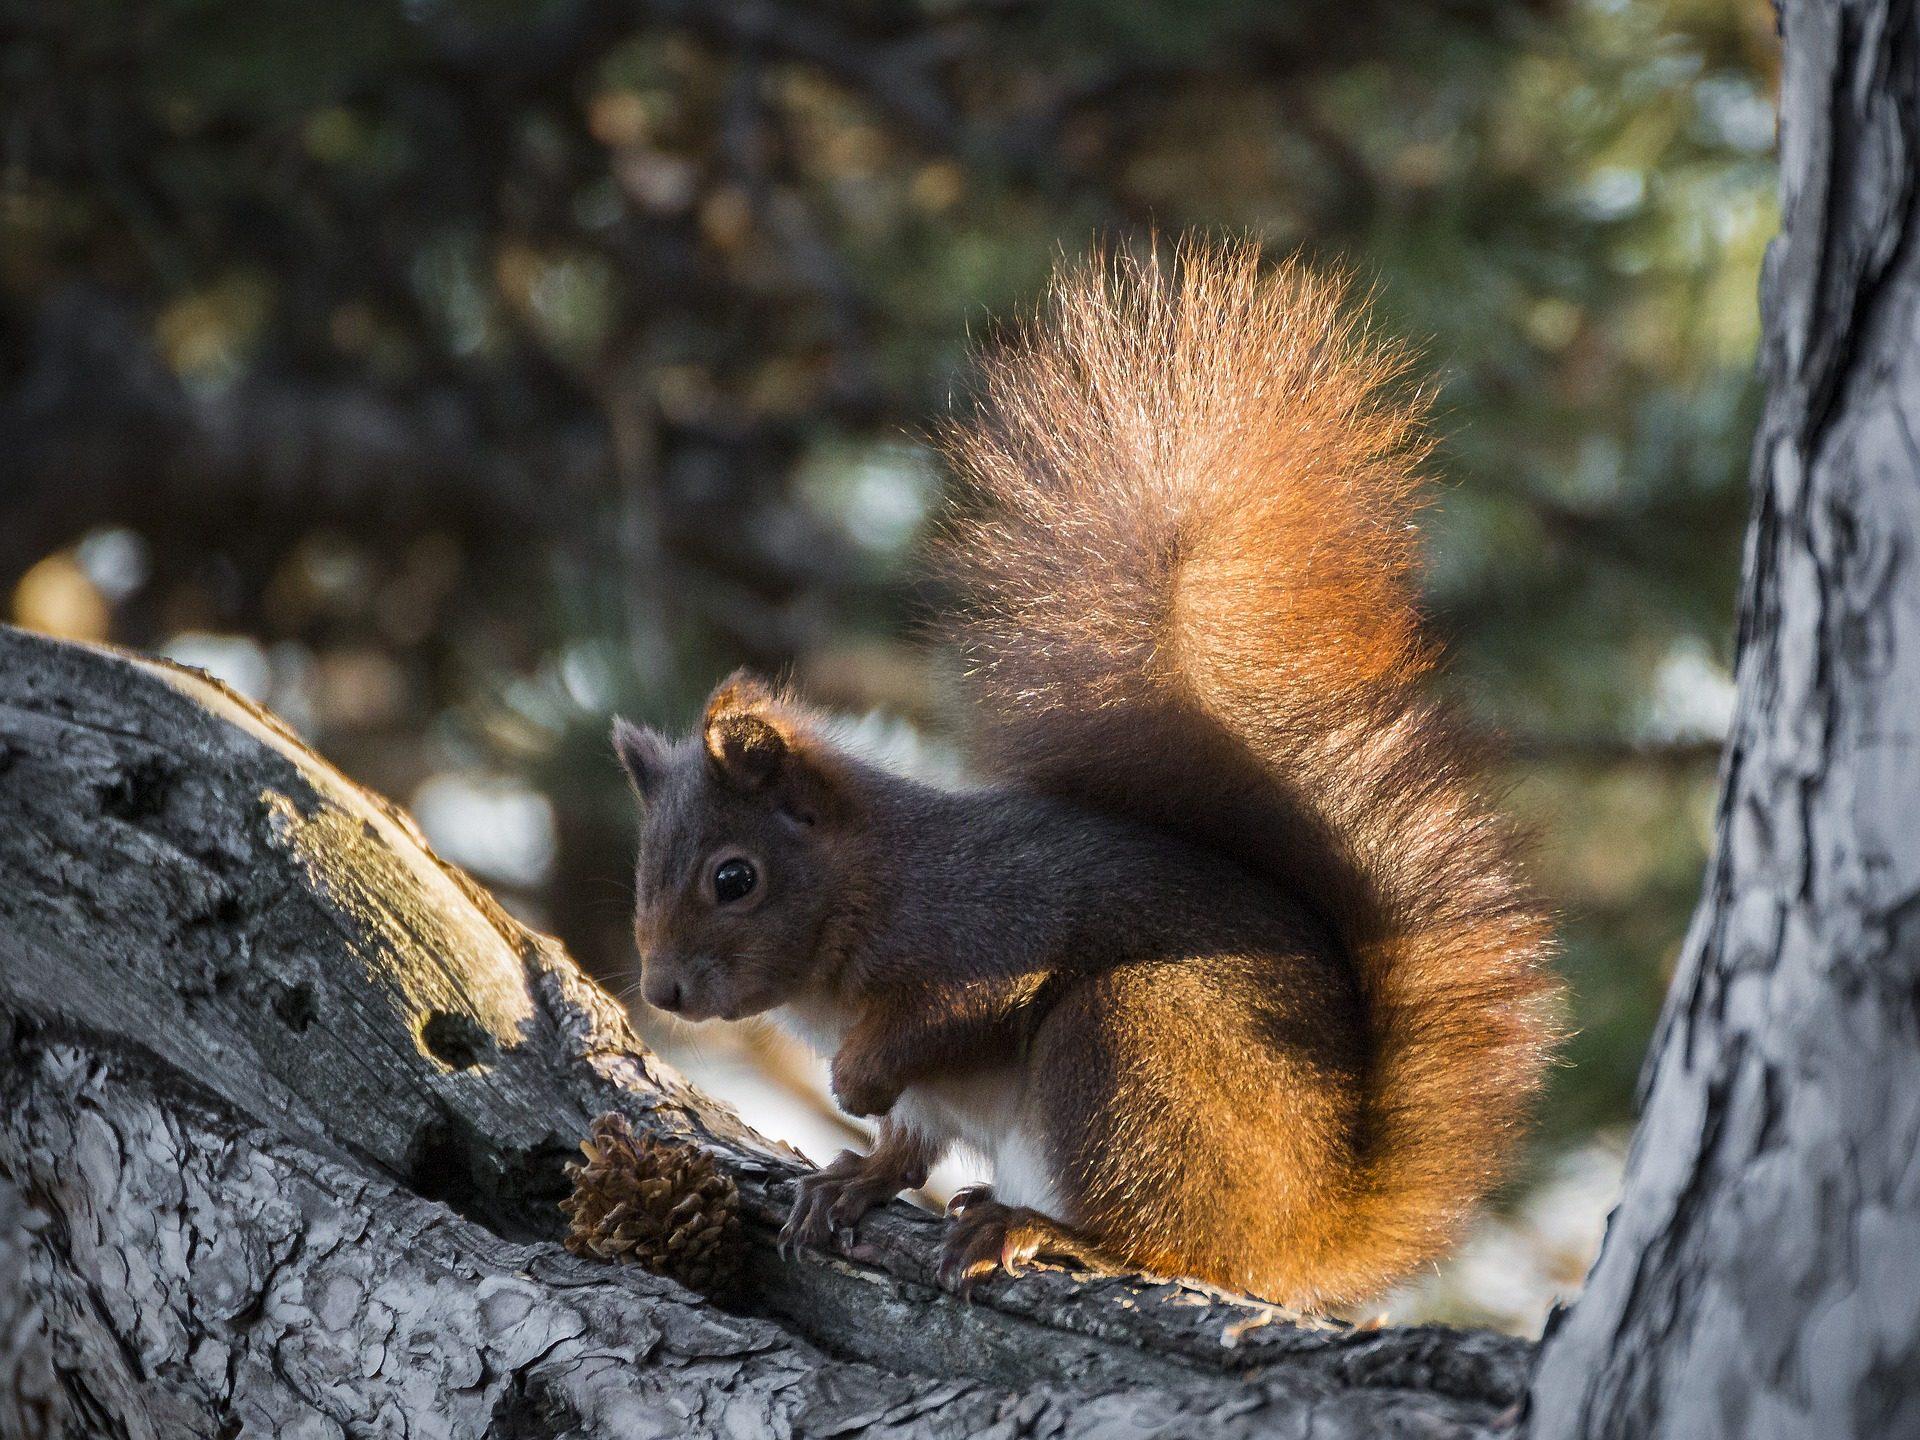 गिलहरी, शाखा, पेड़, फर, कृंतक, वन - HD वॉलपेपर - प्रोफेसर-falken.com